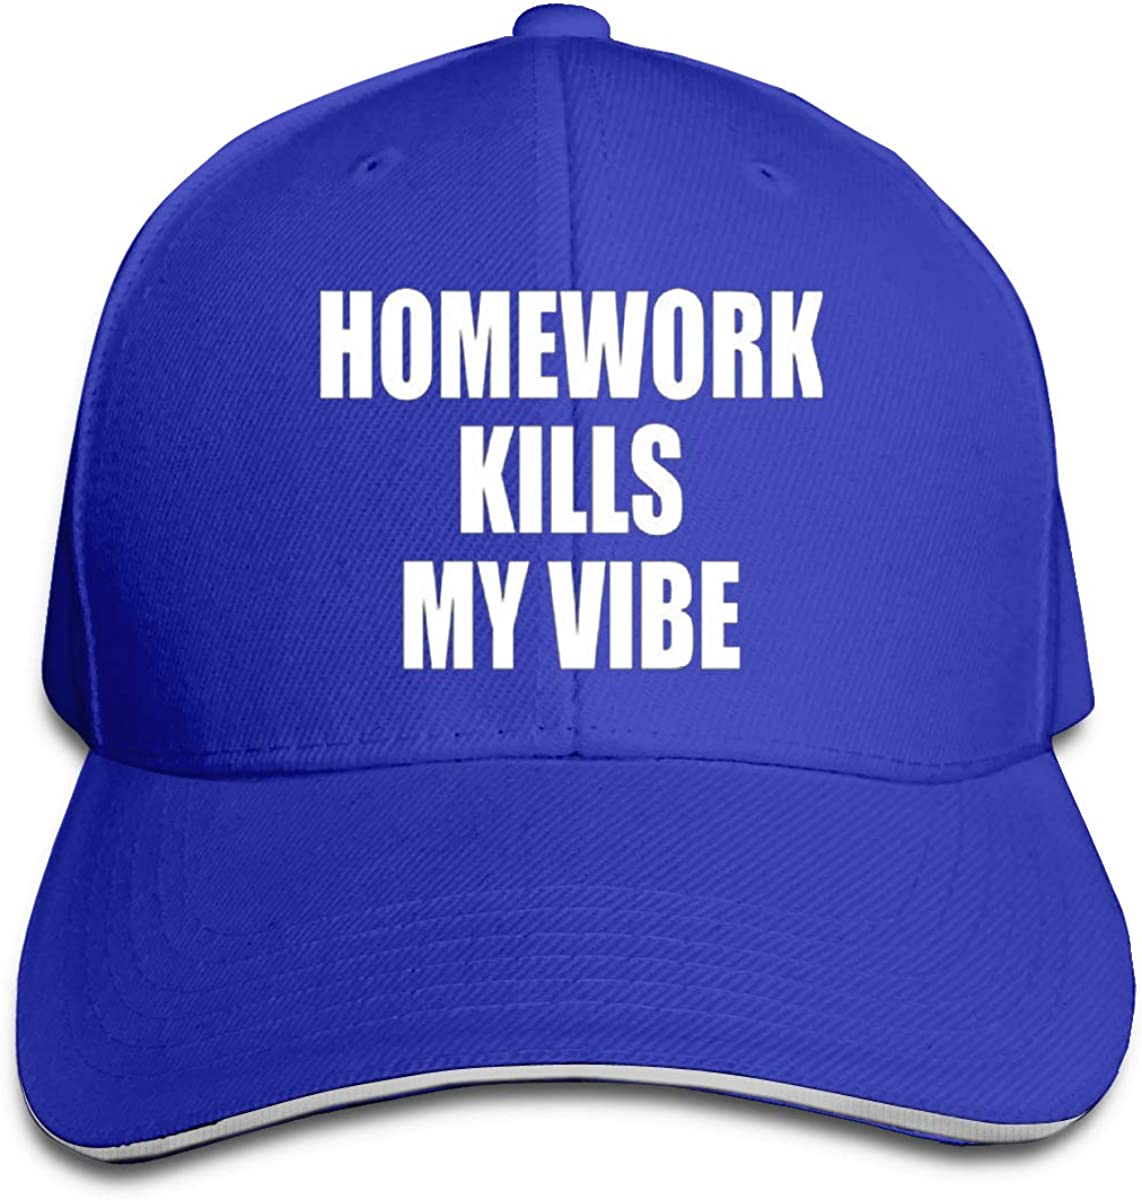 Homework Kills My Vibe Hat Baseball Cap Duck Tongue Cap Fashion Cap